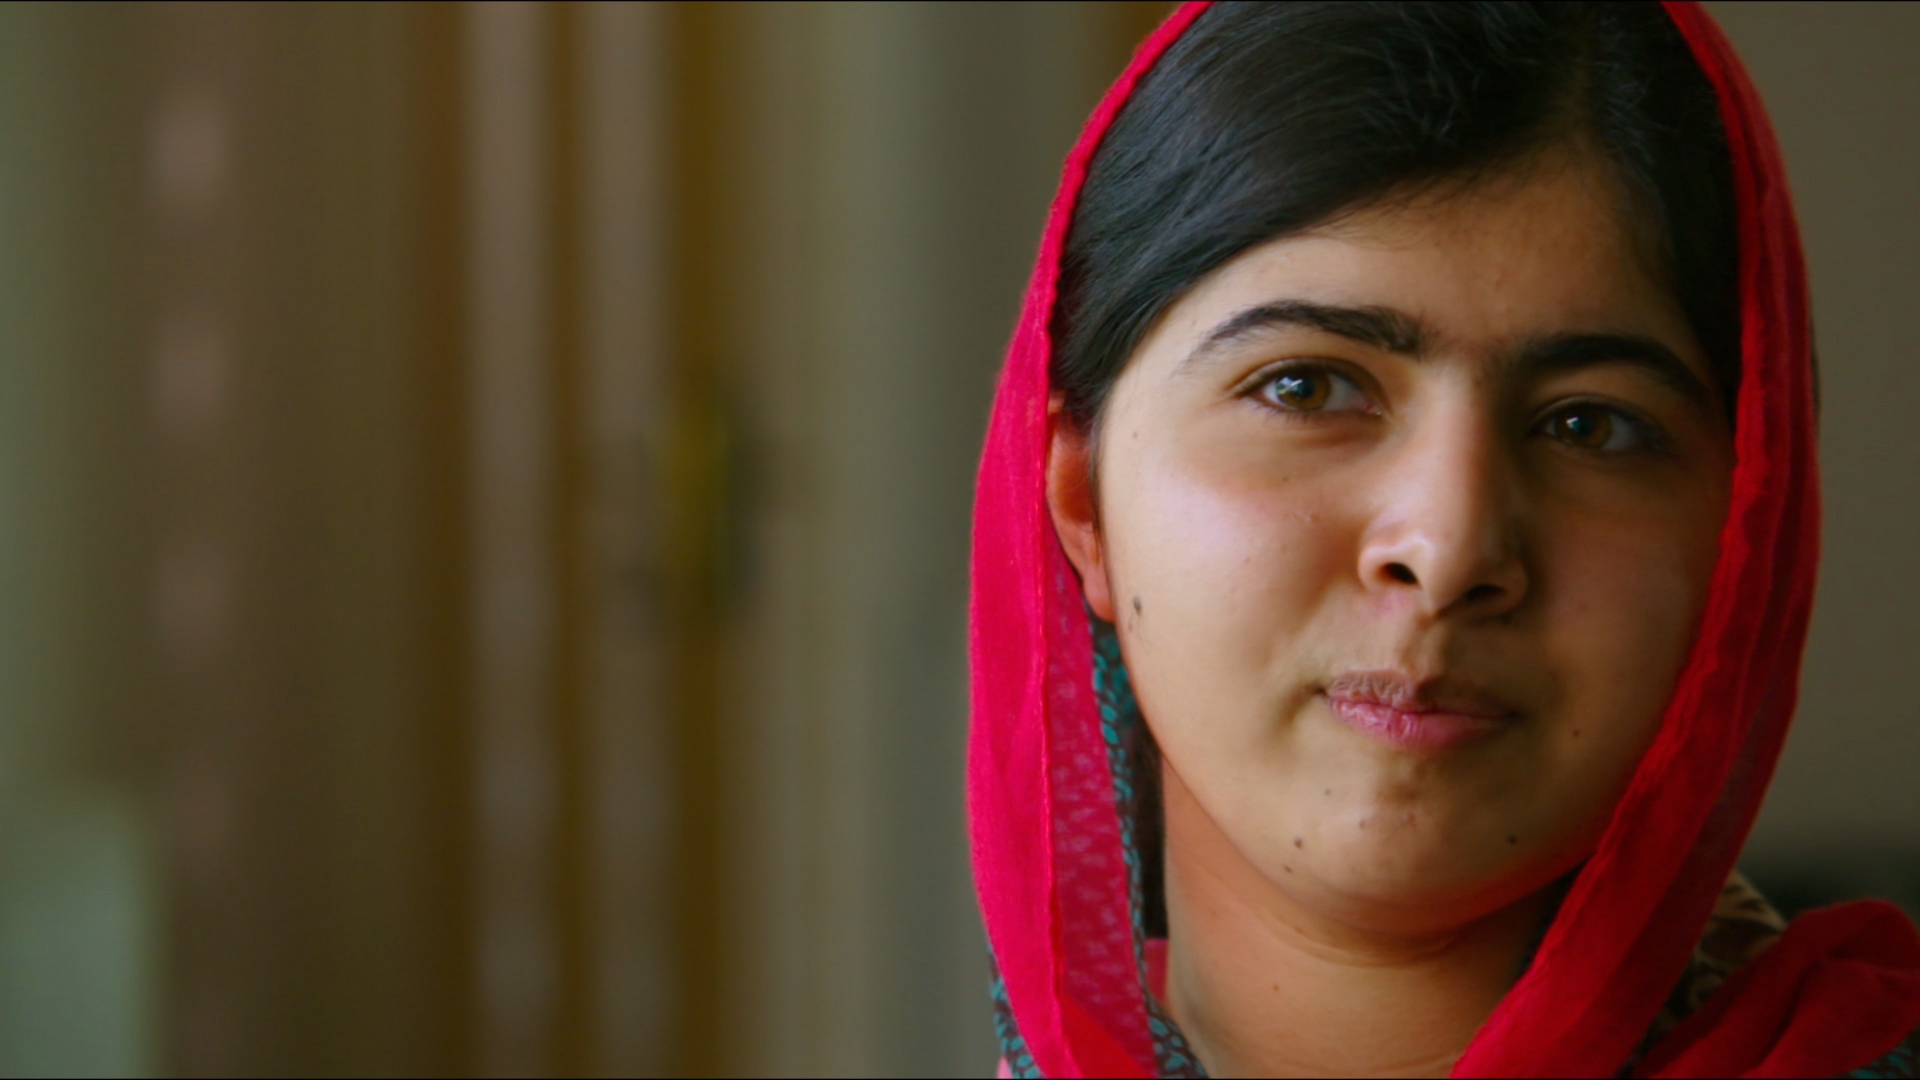 Malala Yousafzai Wallpaper 9   1920 X 1080 stmednet 1920x1080